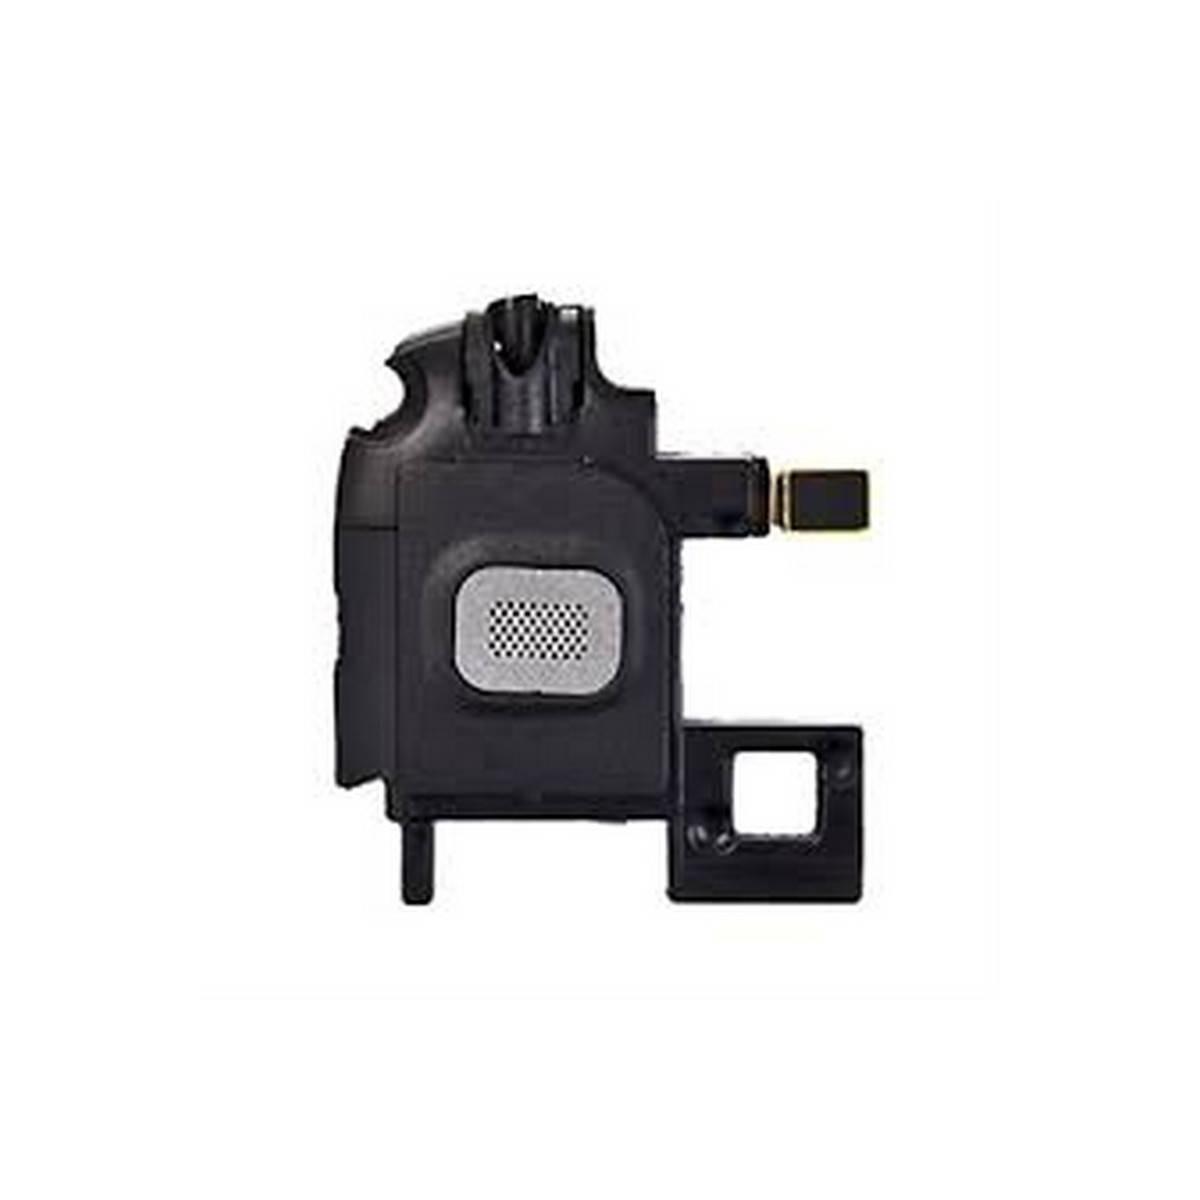 Altavoz para Samsung Galaxy S3 Mini I8190